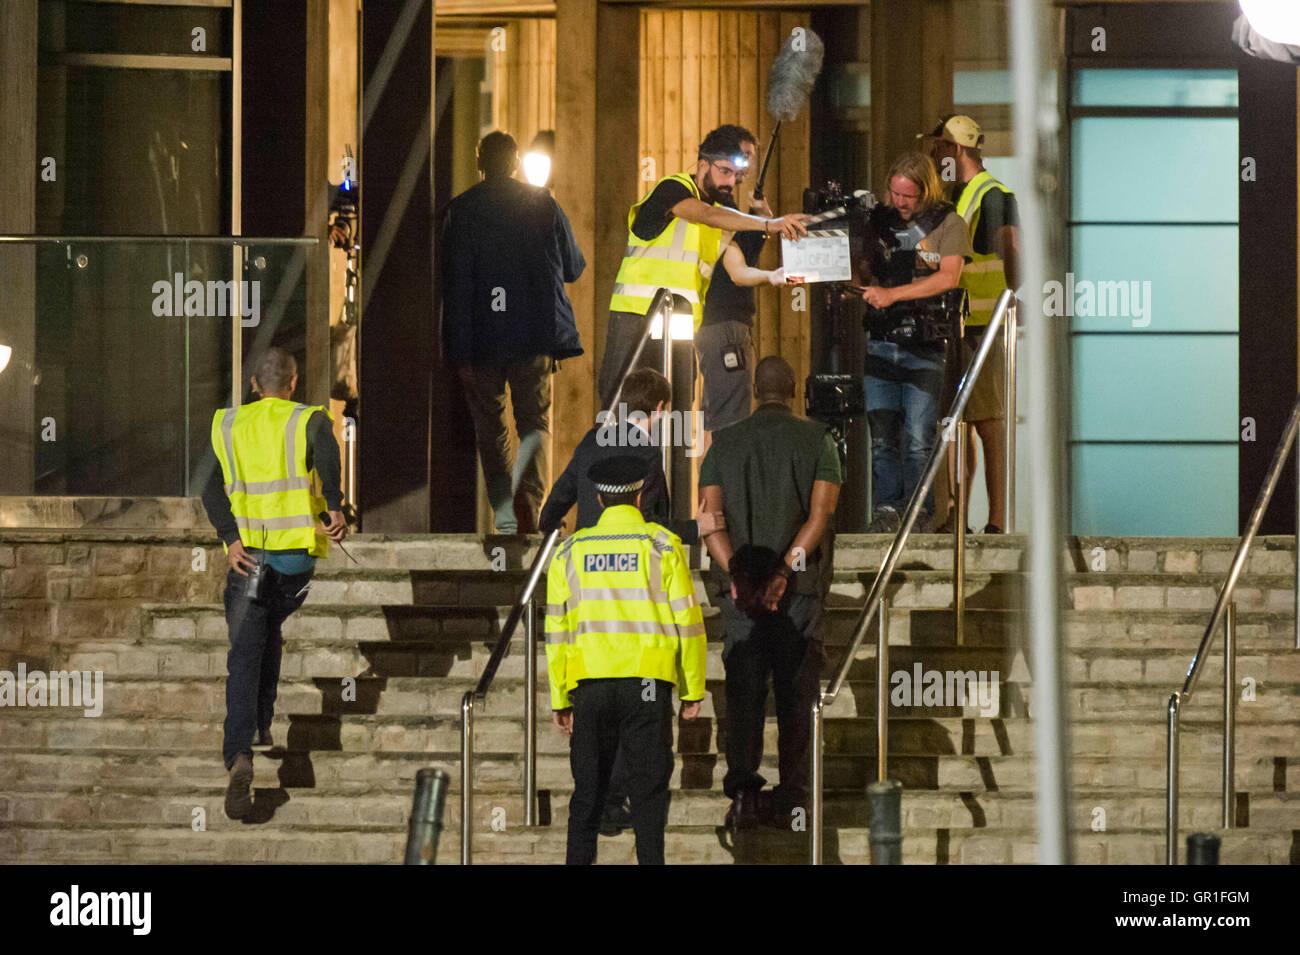 West Bay, Dorset, UK - 6th September 2016 - David Tennant and Sir Lenny Henry filming arrest scene on the steps - Stock Image